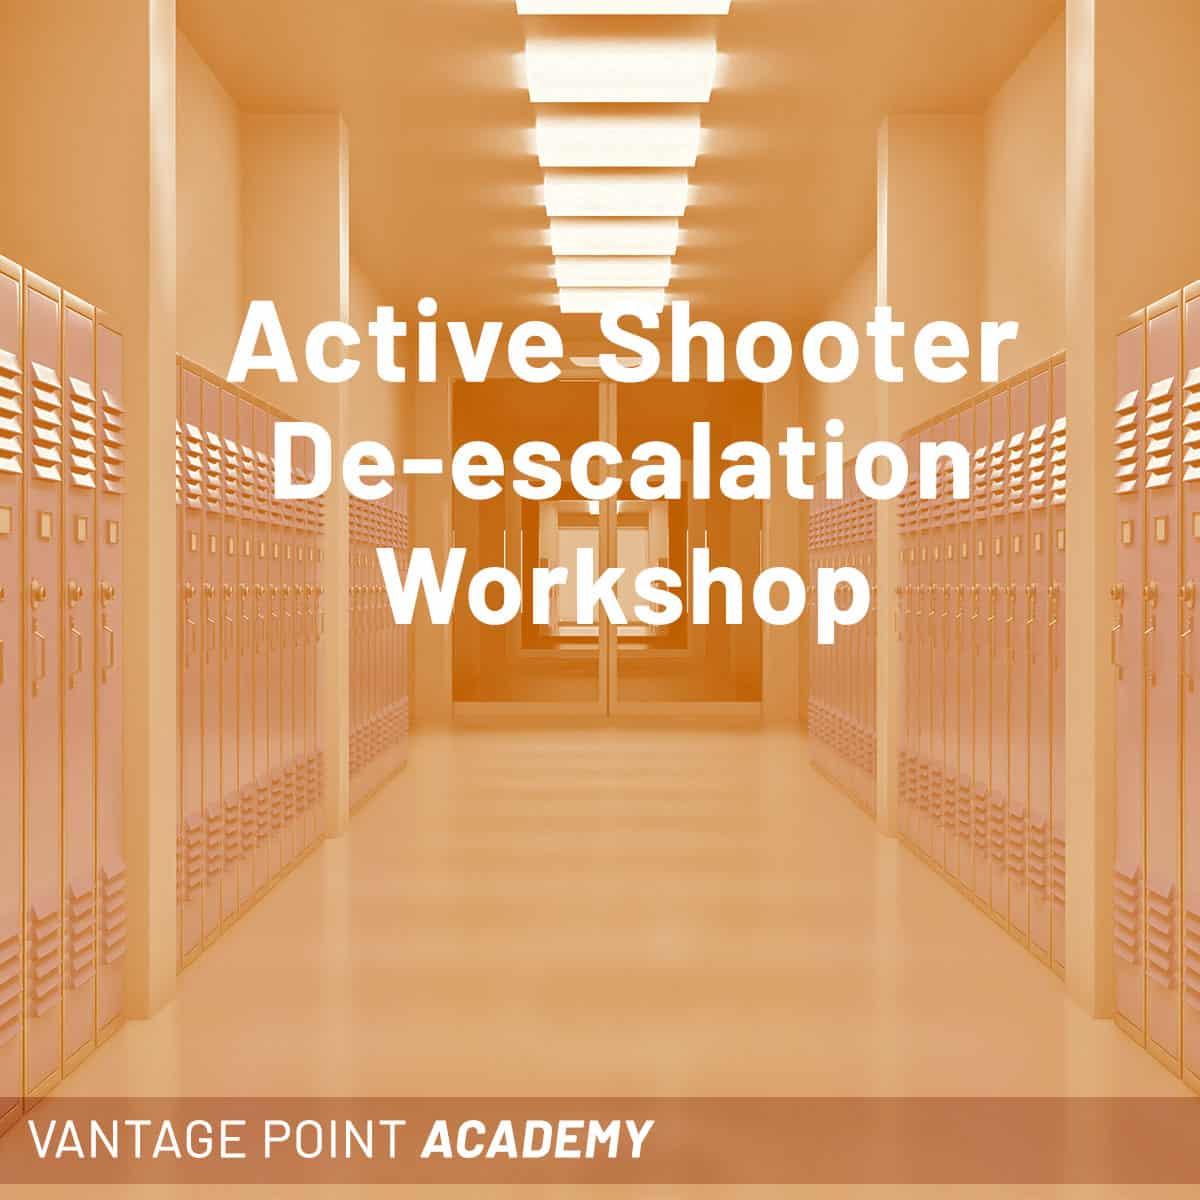 Active Shooter De-escalation workshop